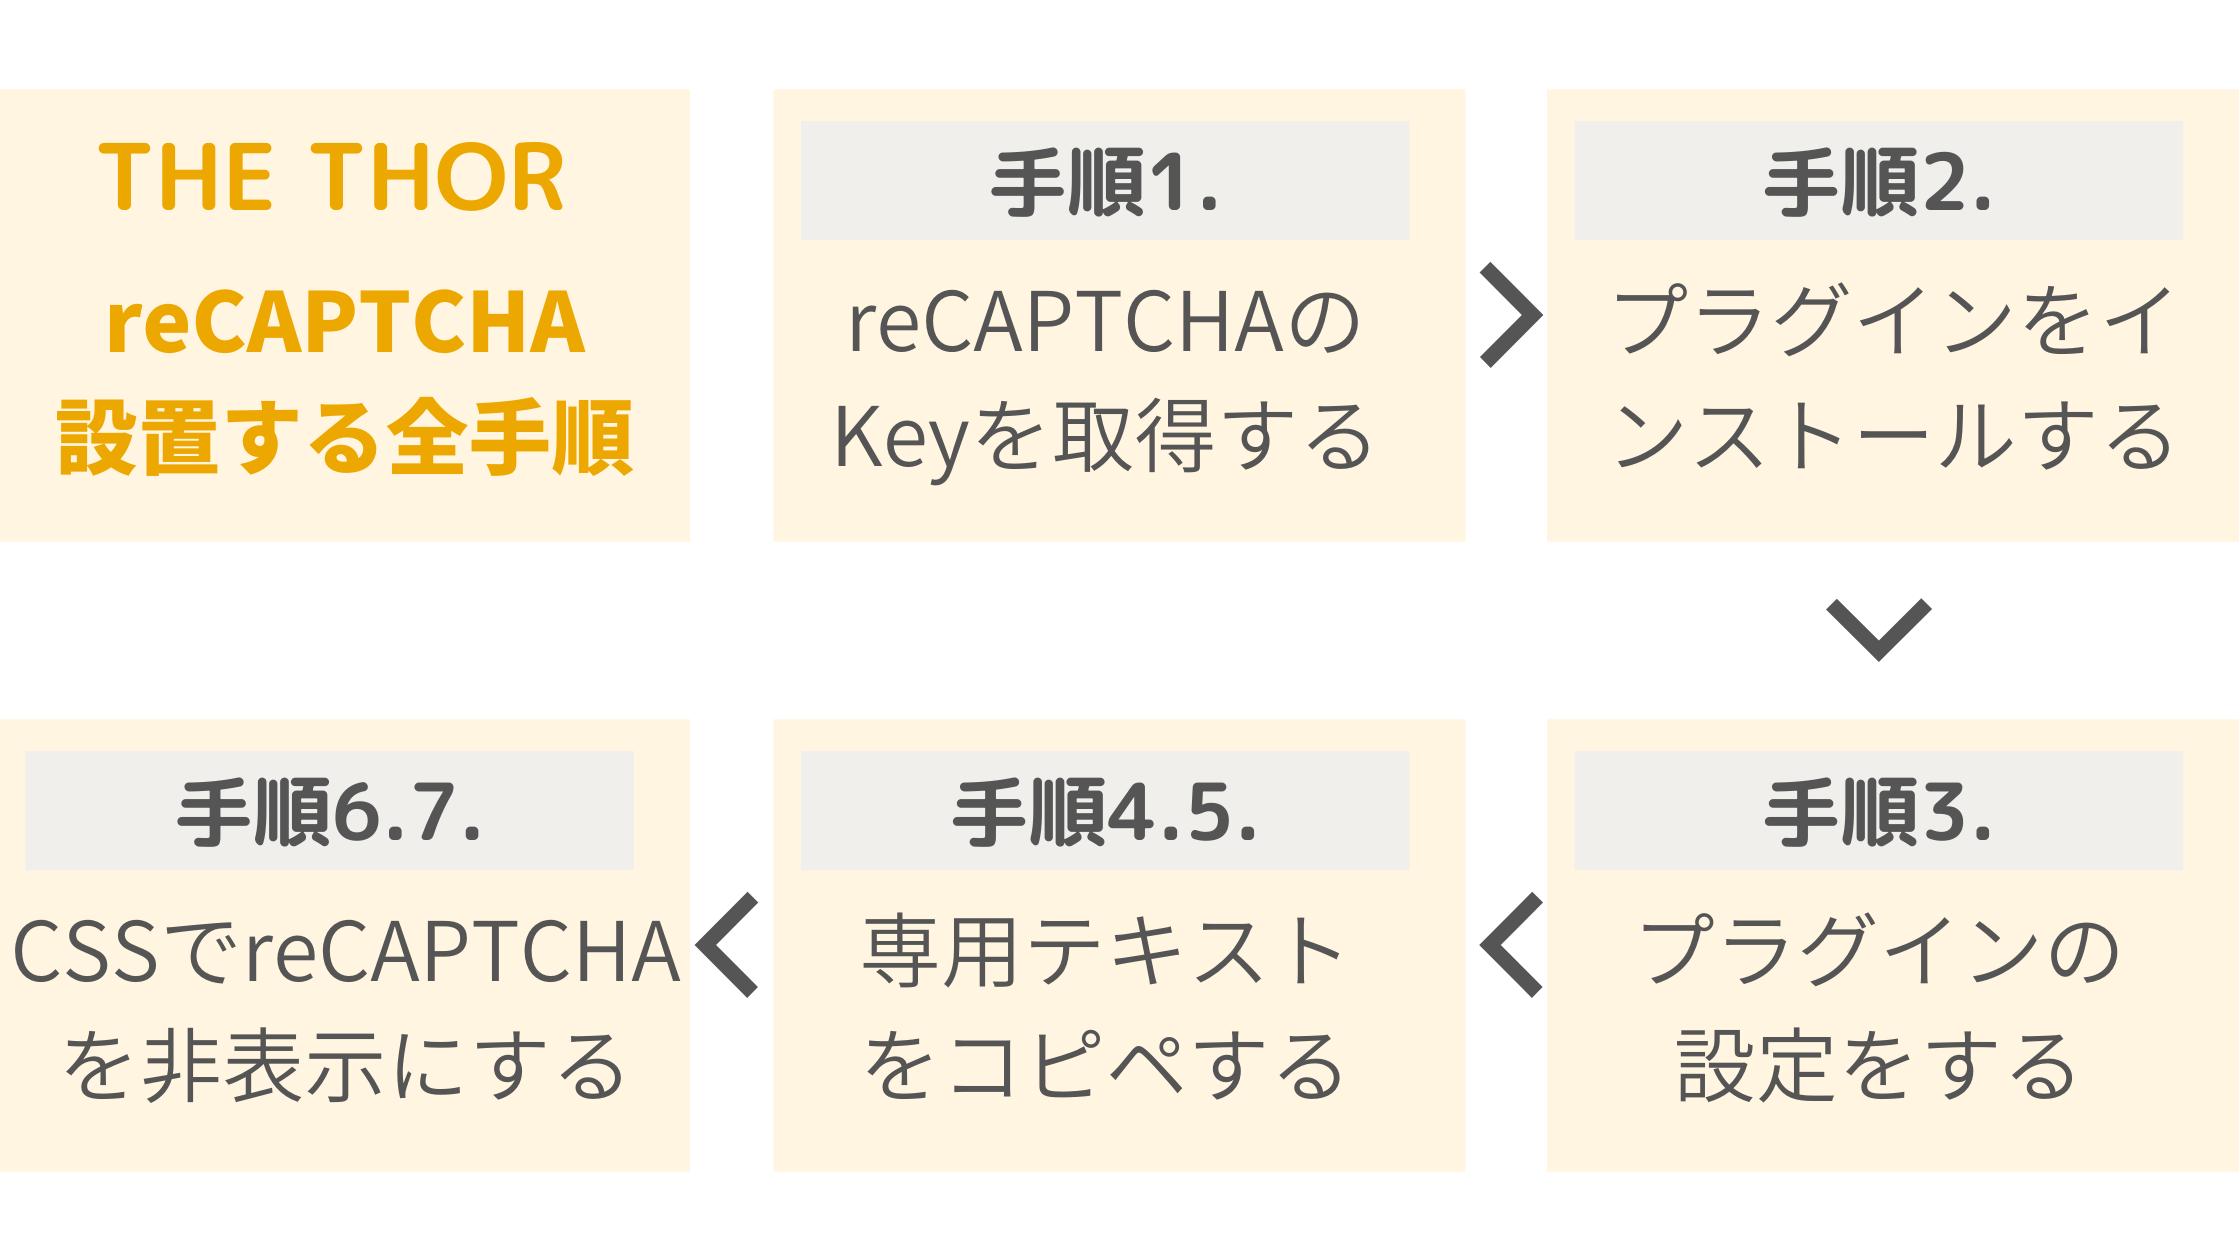 THE THOR向けreCAPTCHAの設定方法